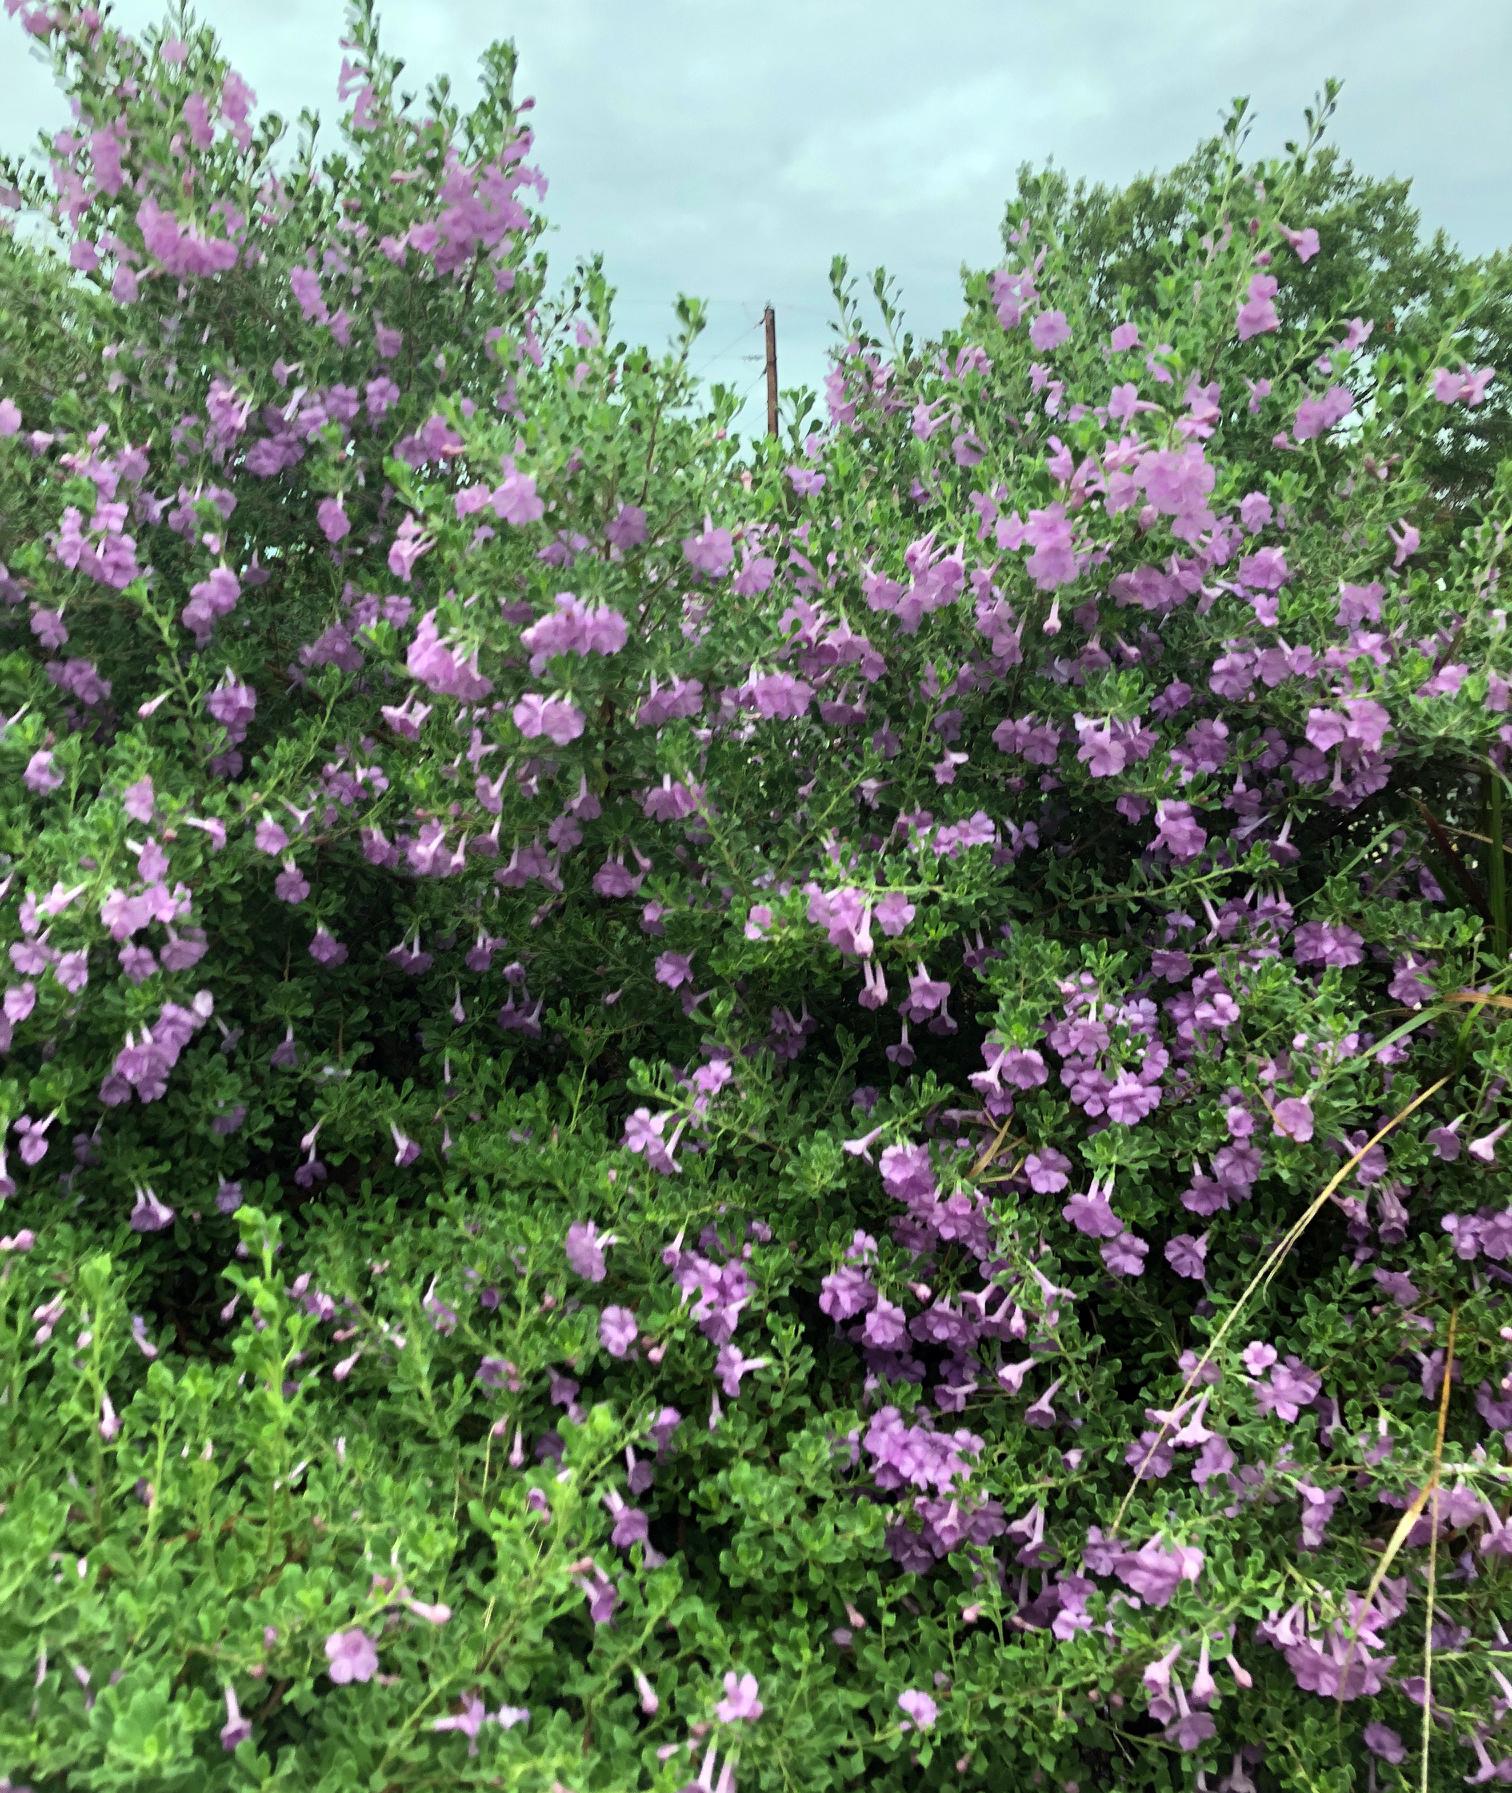 Texas sage leucophyllum langmaniae lynns legacy flowers